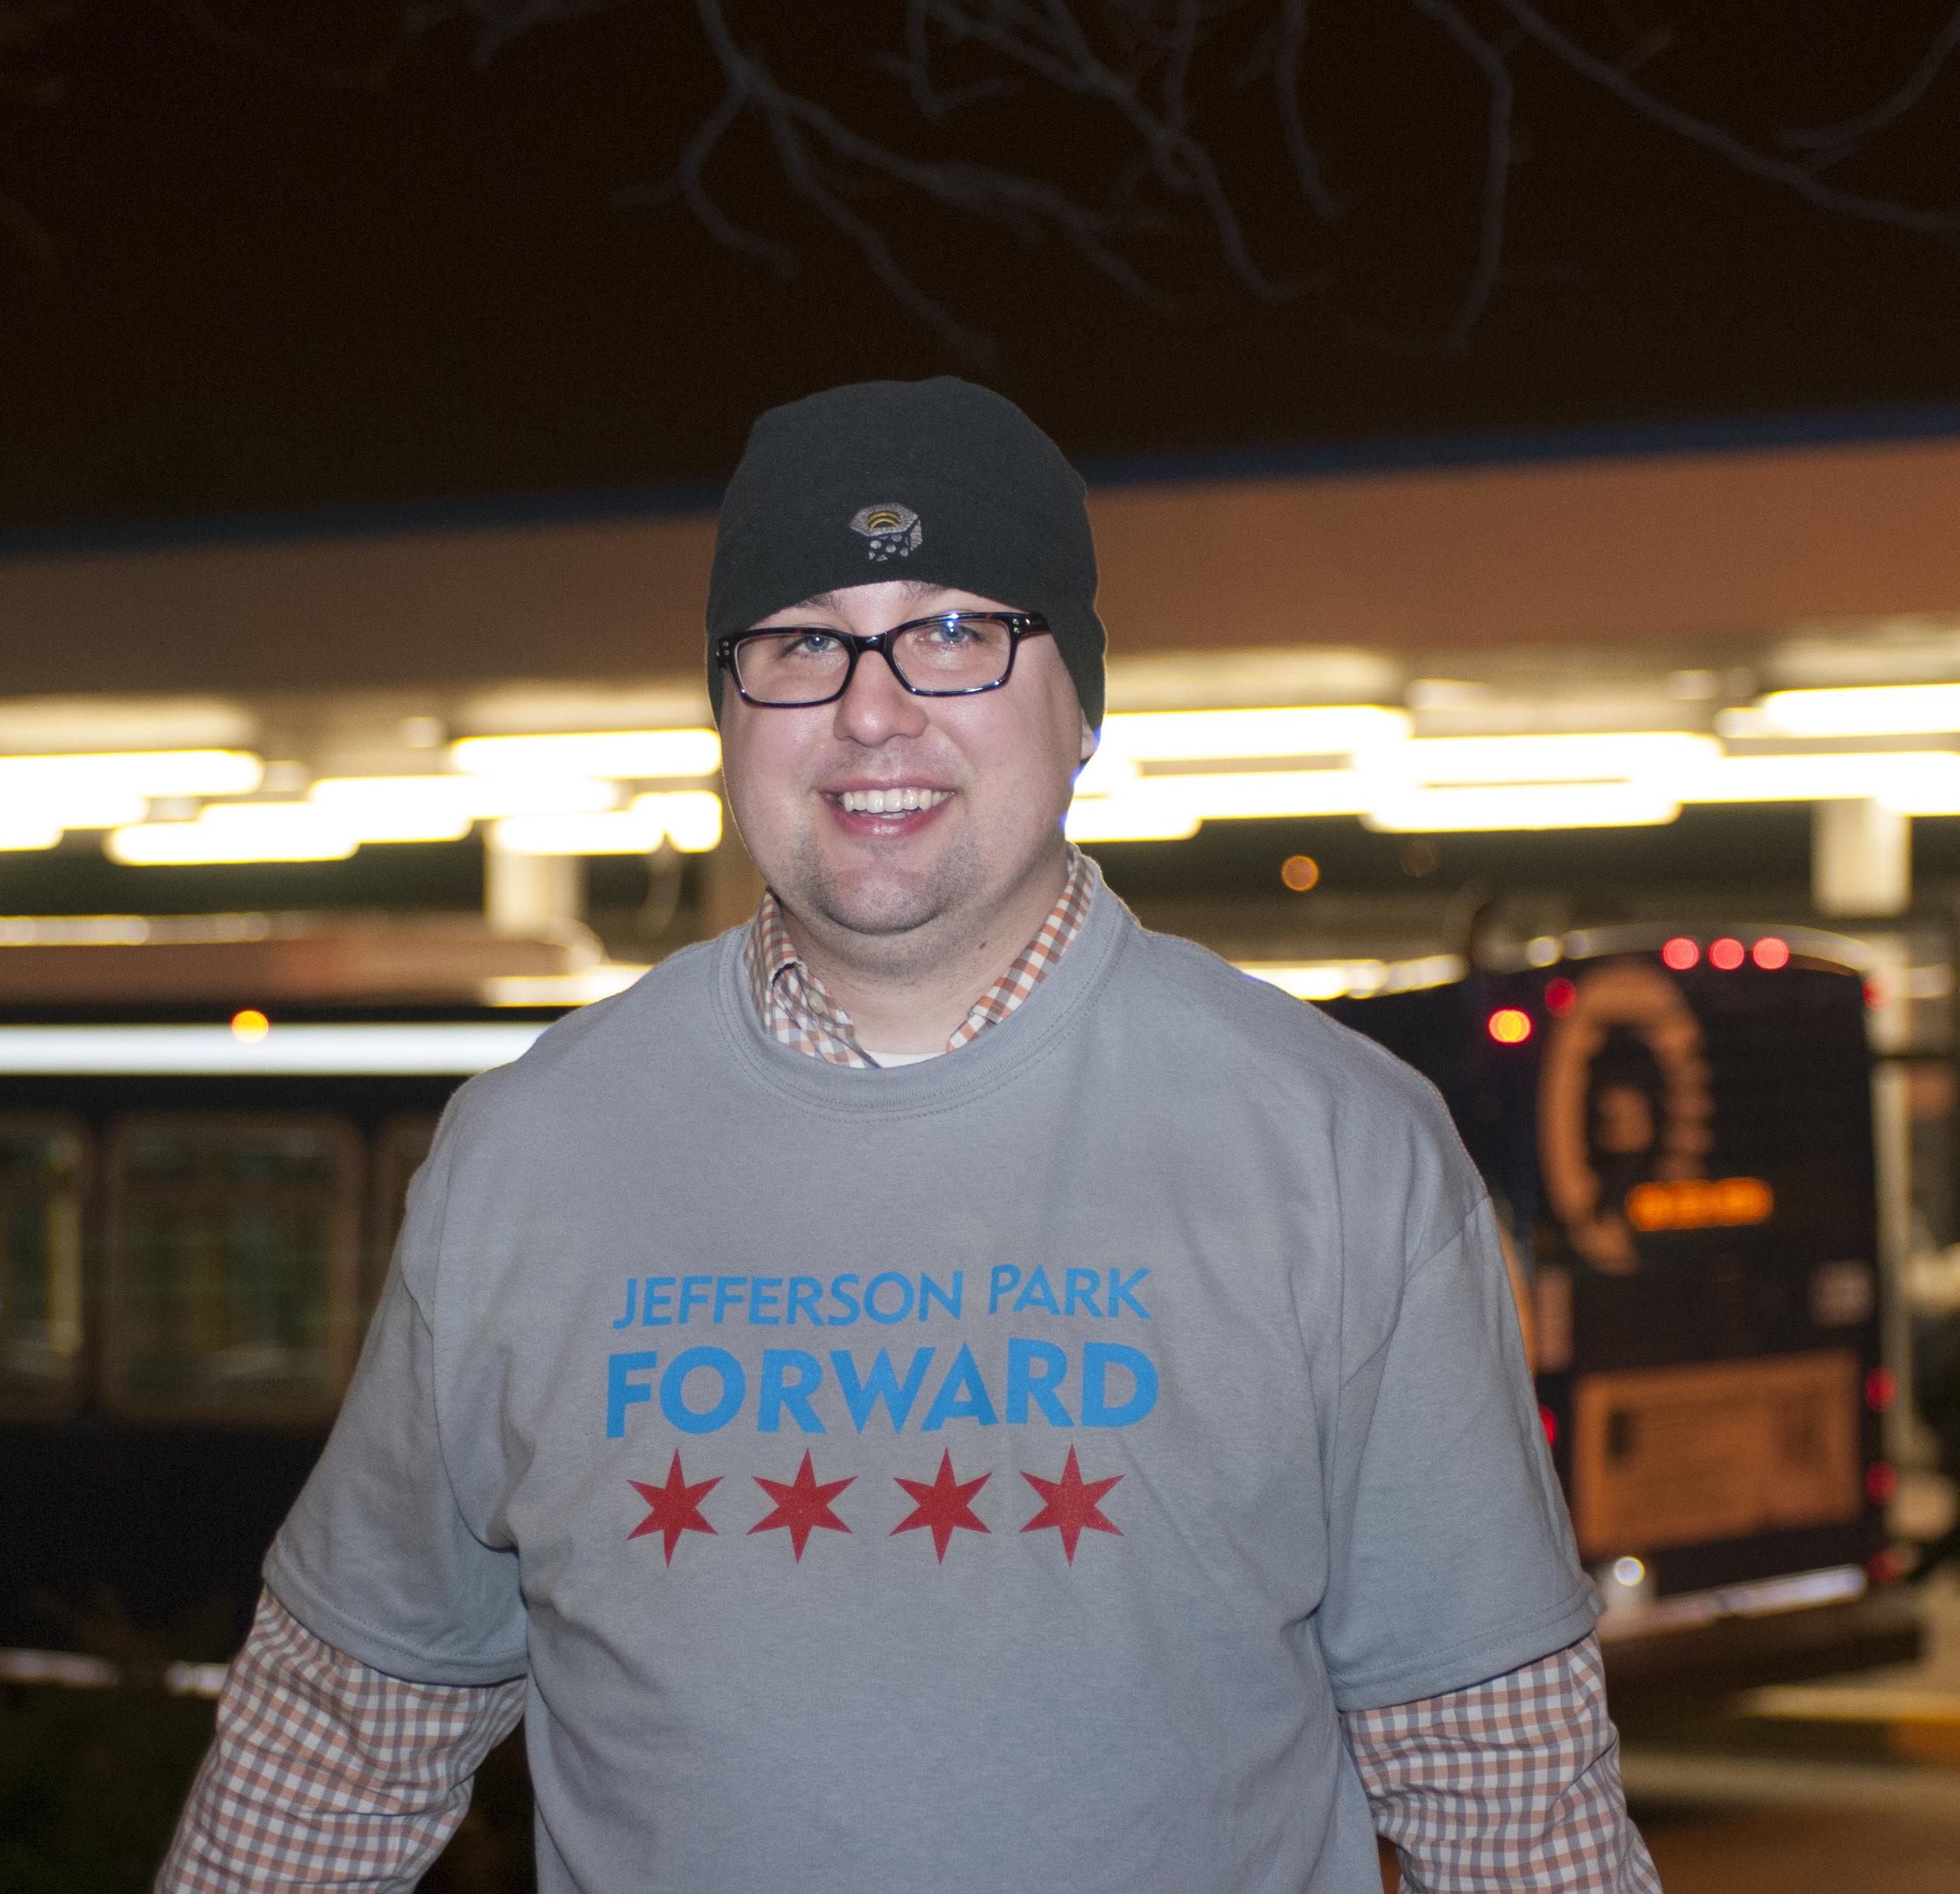 Jefferson Park Forward founder Ryan Richter